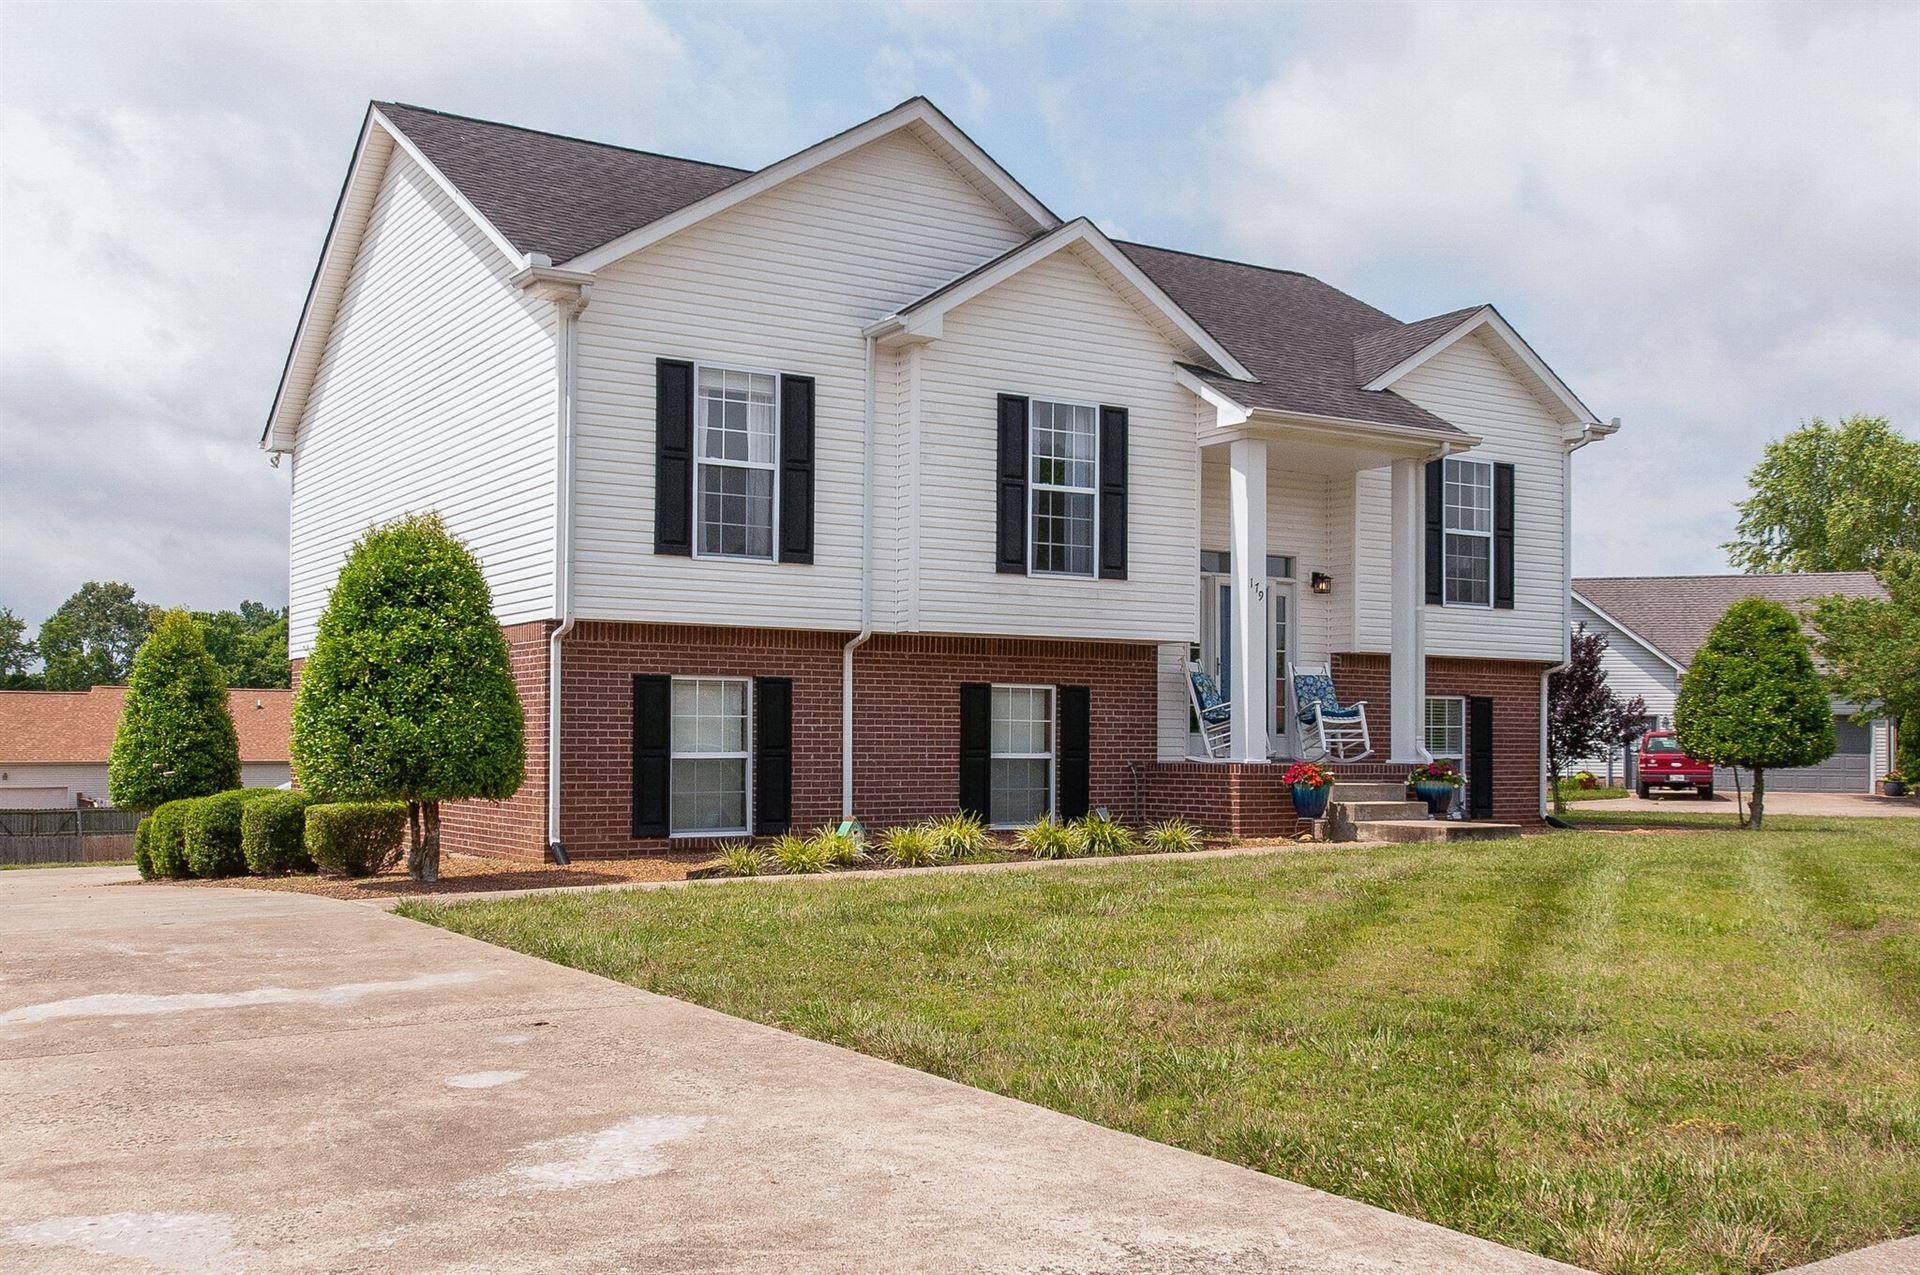 179 Jacob Dr, Pleasant View, TN 37146 - MLS#: 2265463